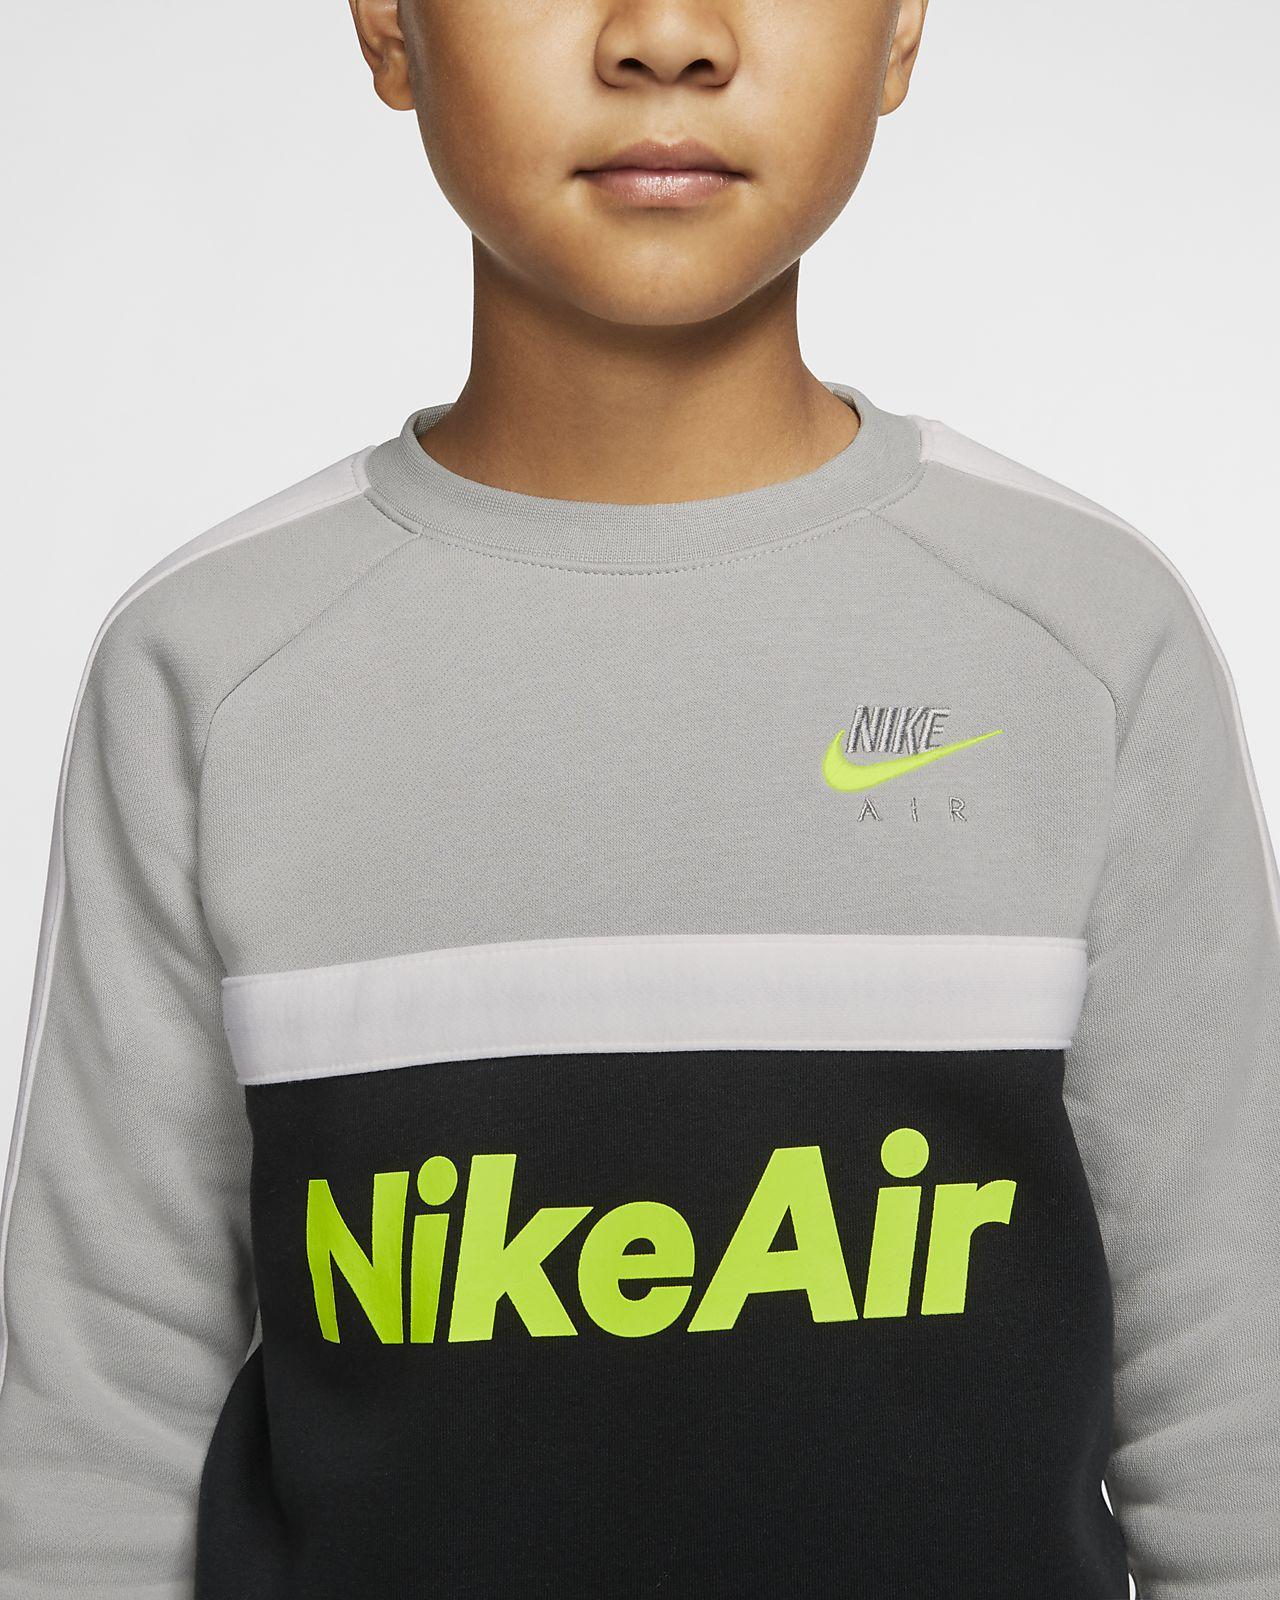 Nike Kids Boys Color Block Fleece Crew Neck Sweatshirt Little Kids Active  Active Sweatshirts